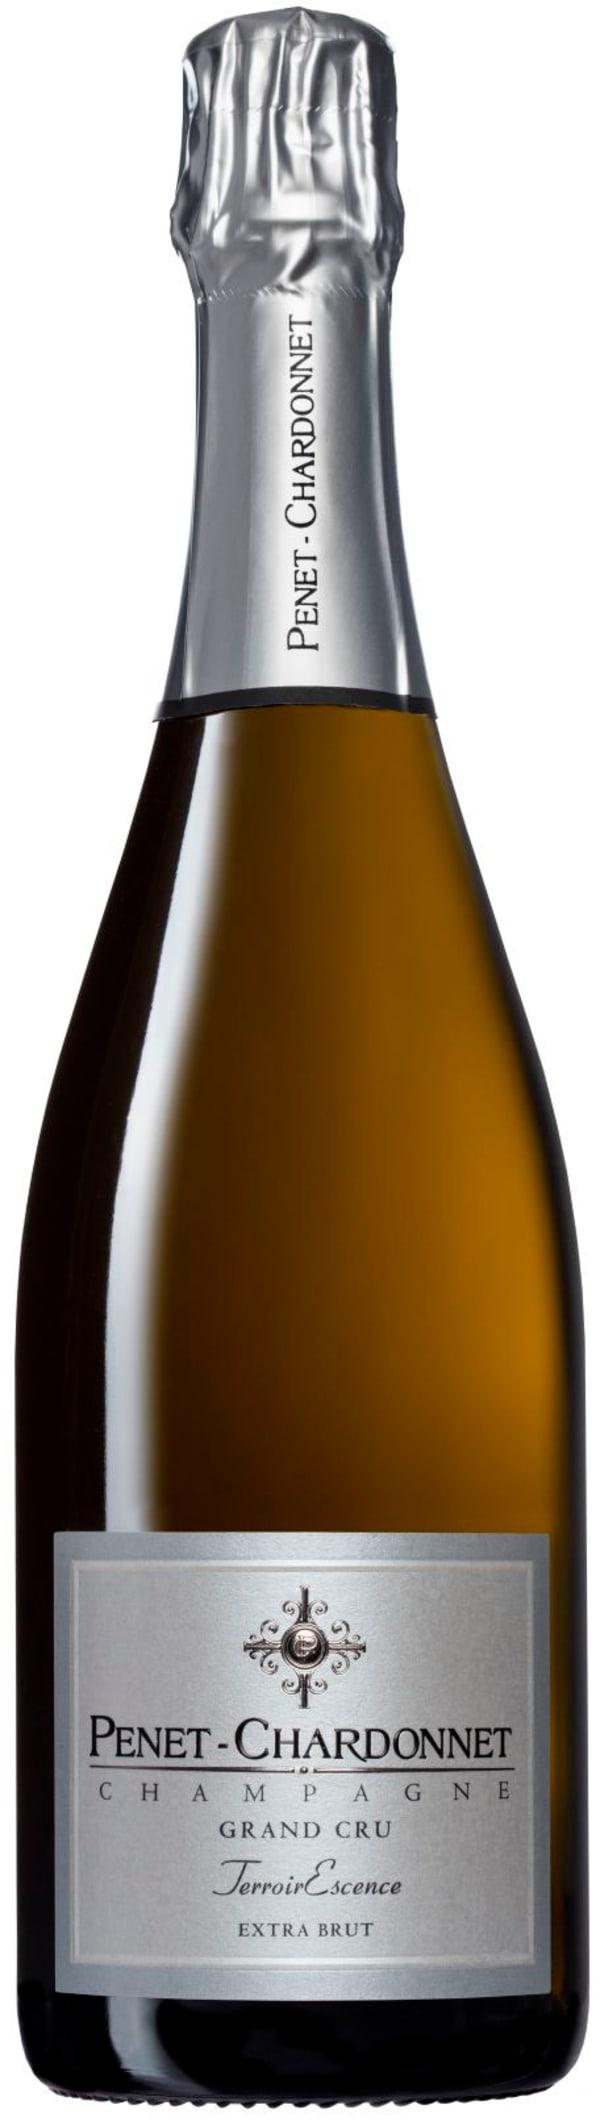 Penet Chardonnet Grand Cru Terroir Escence Champagne Extra Brut